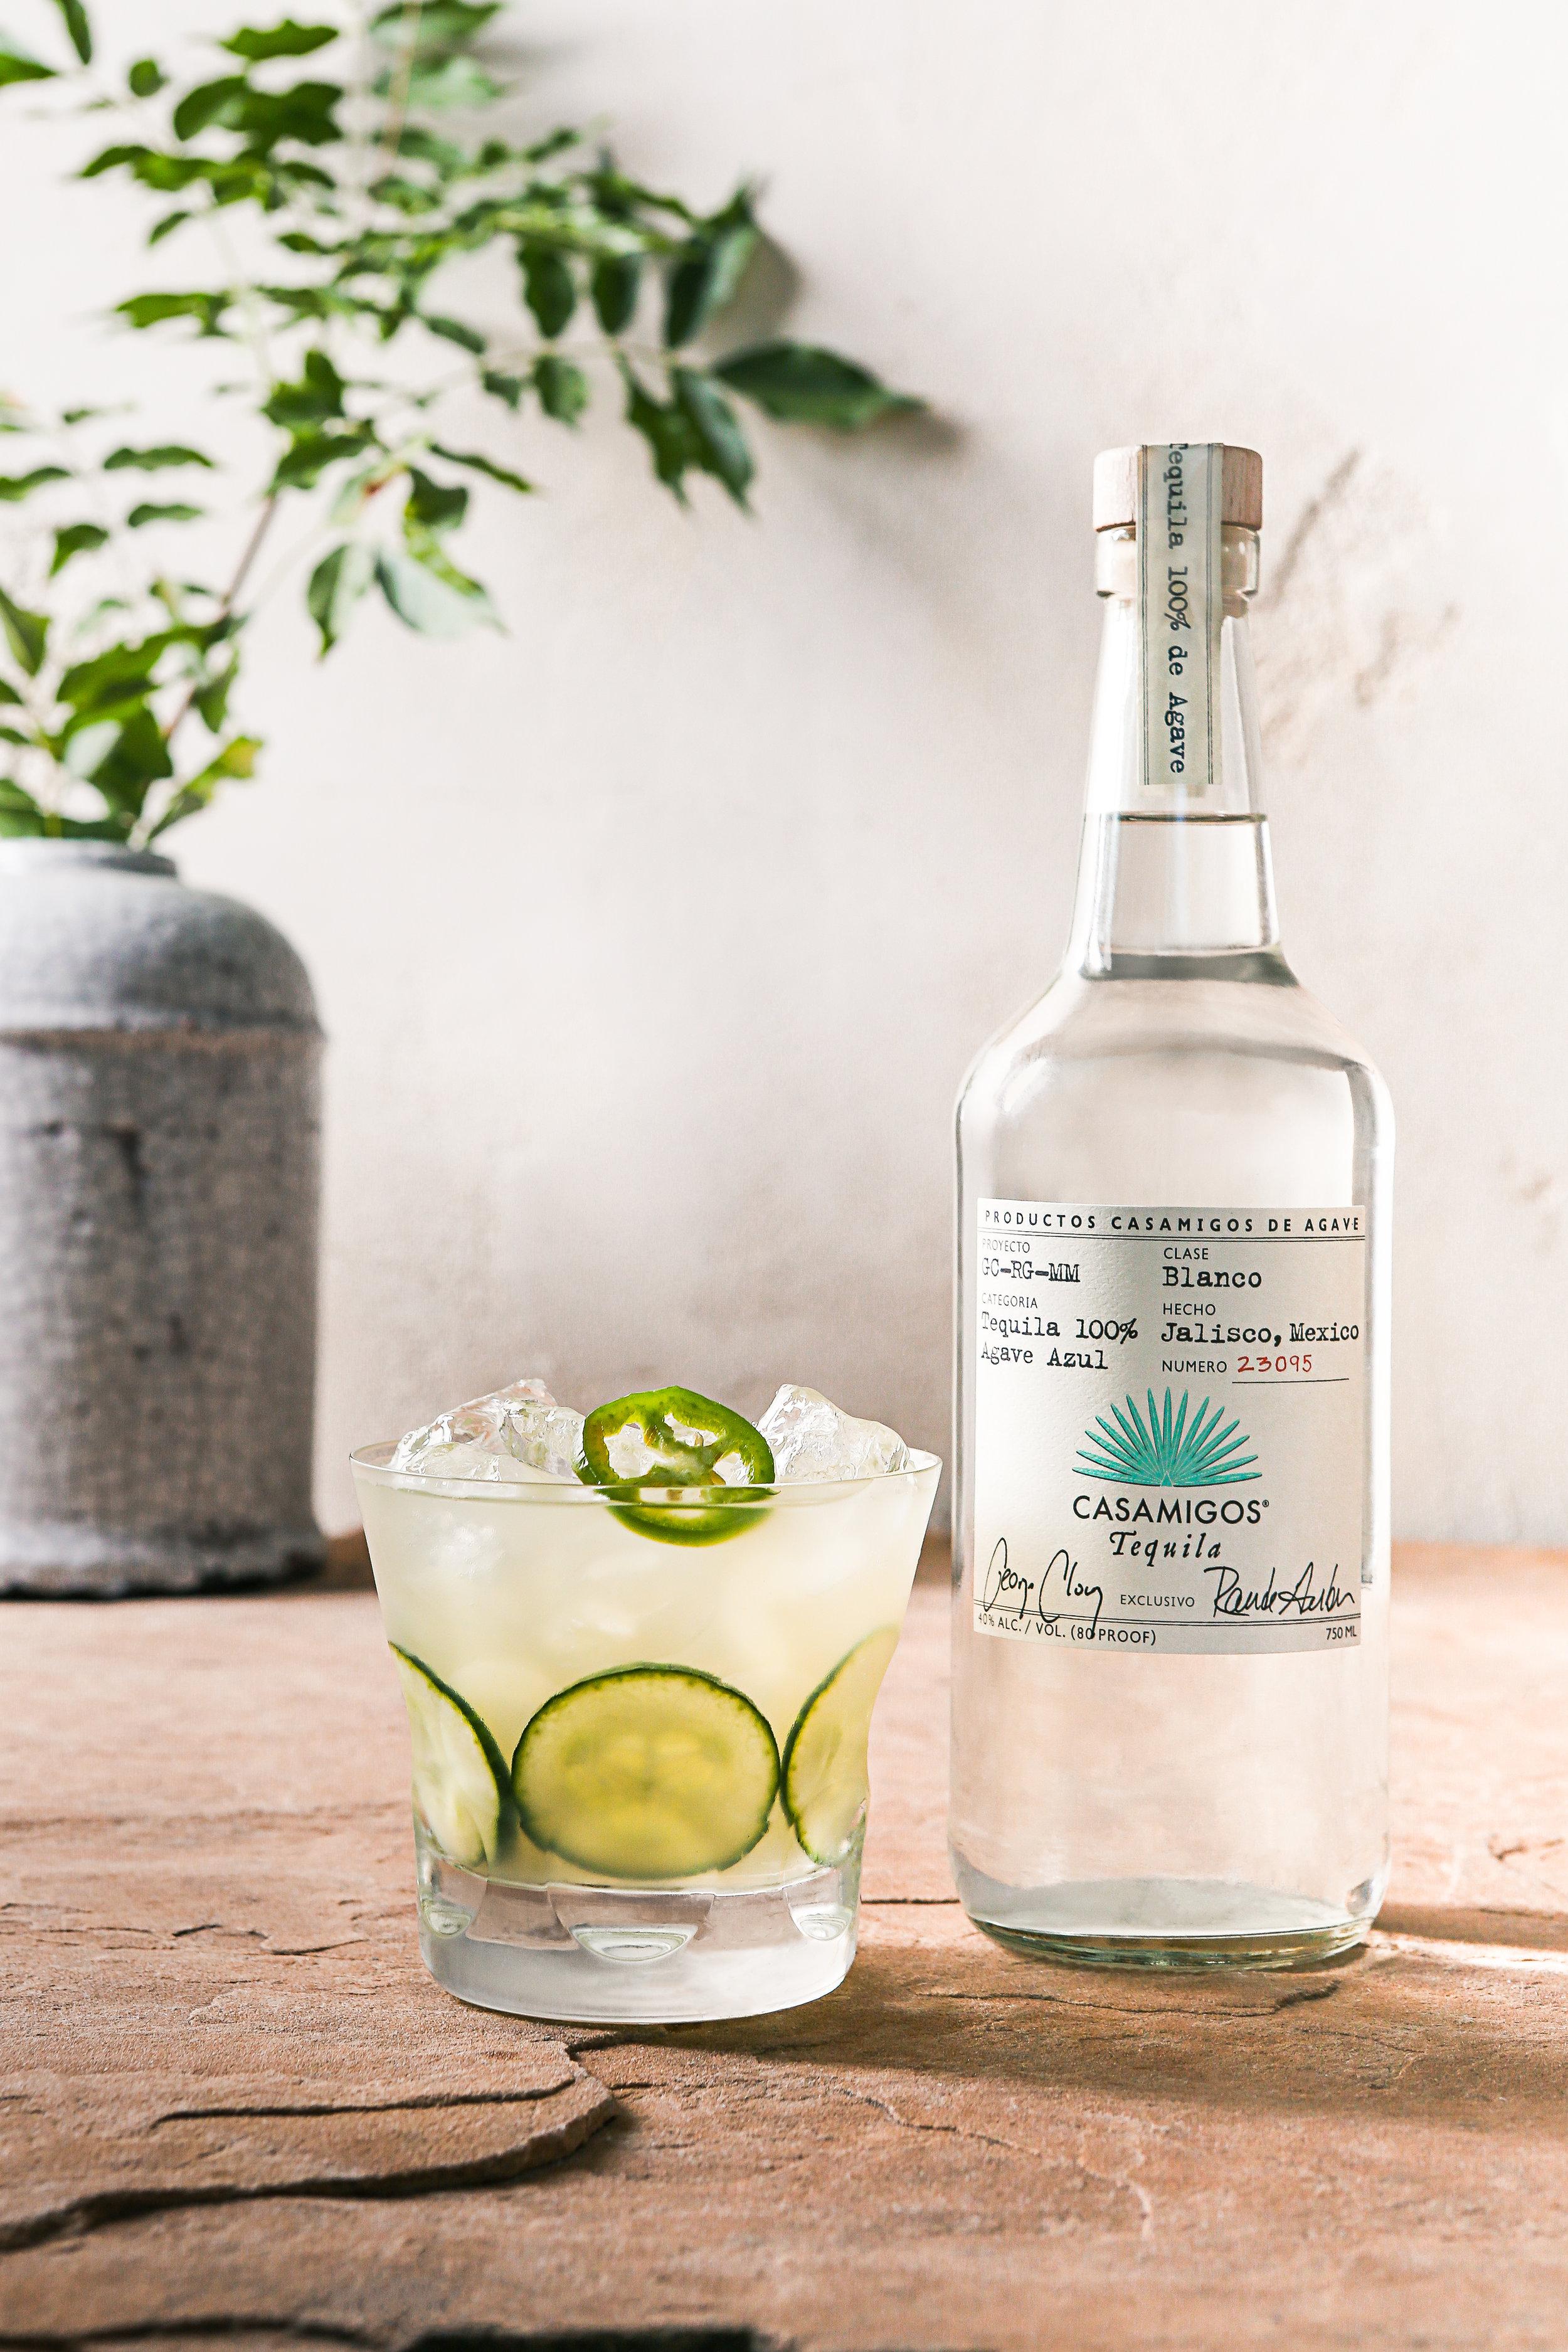 Spicy Cucumber Margarita Casamigos Tequila